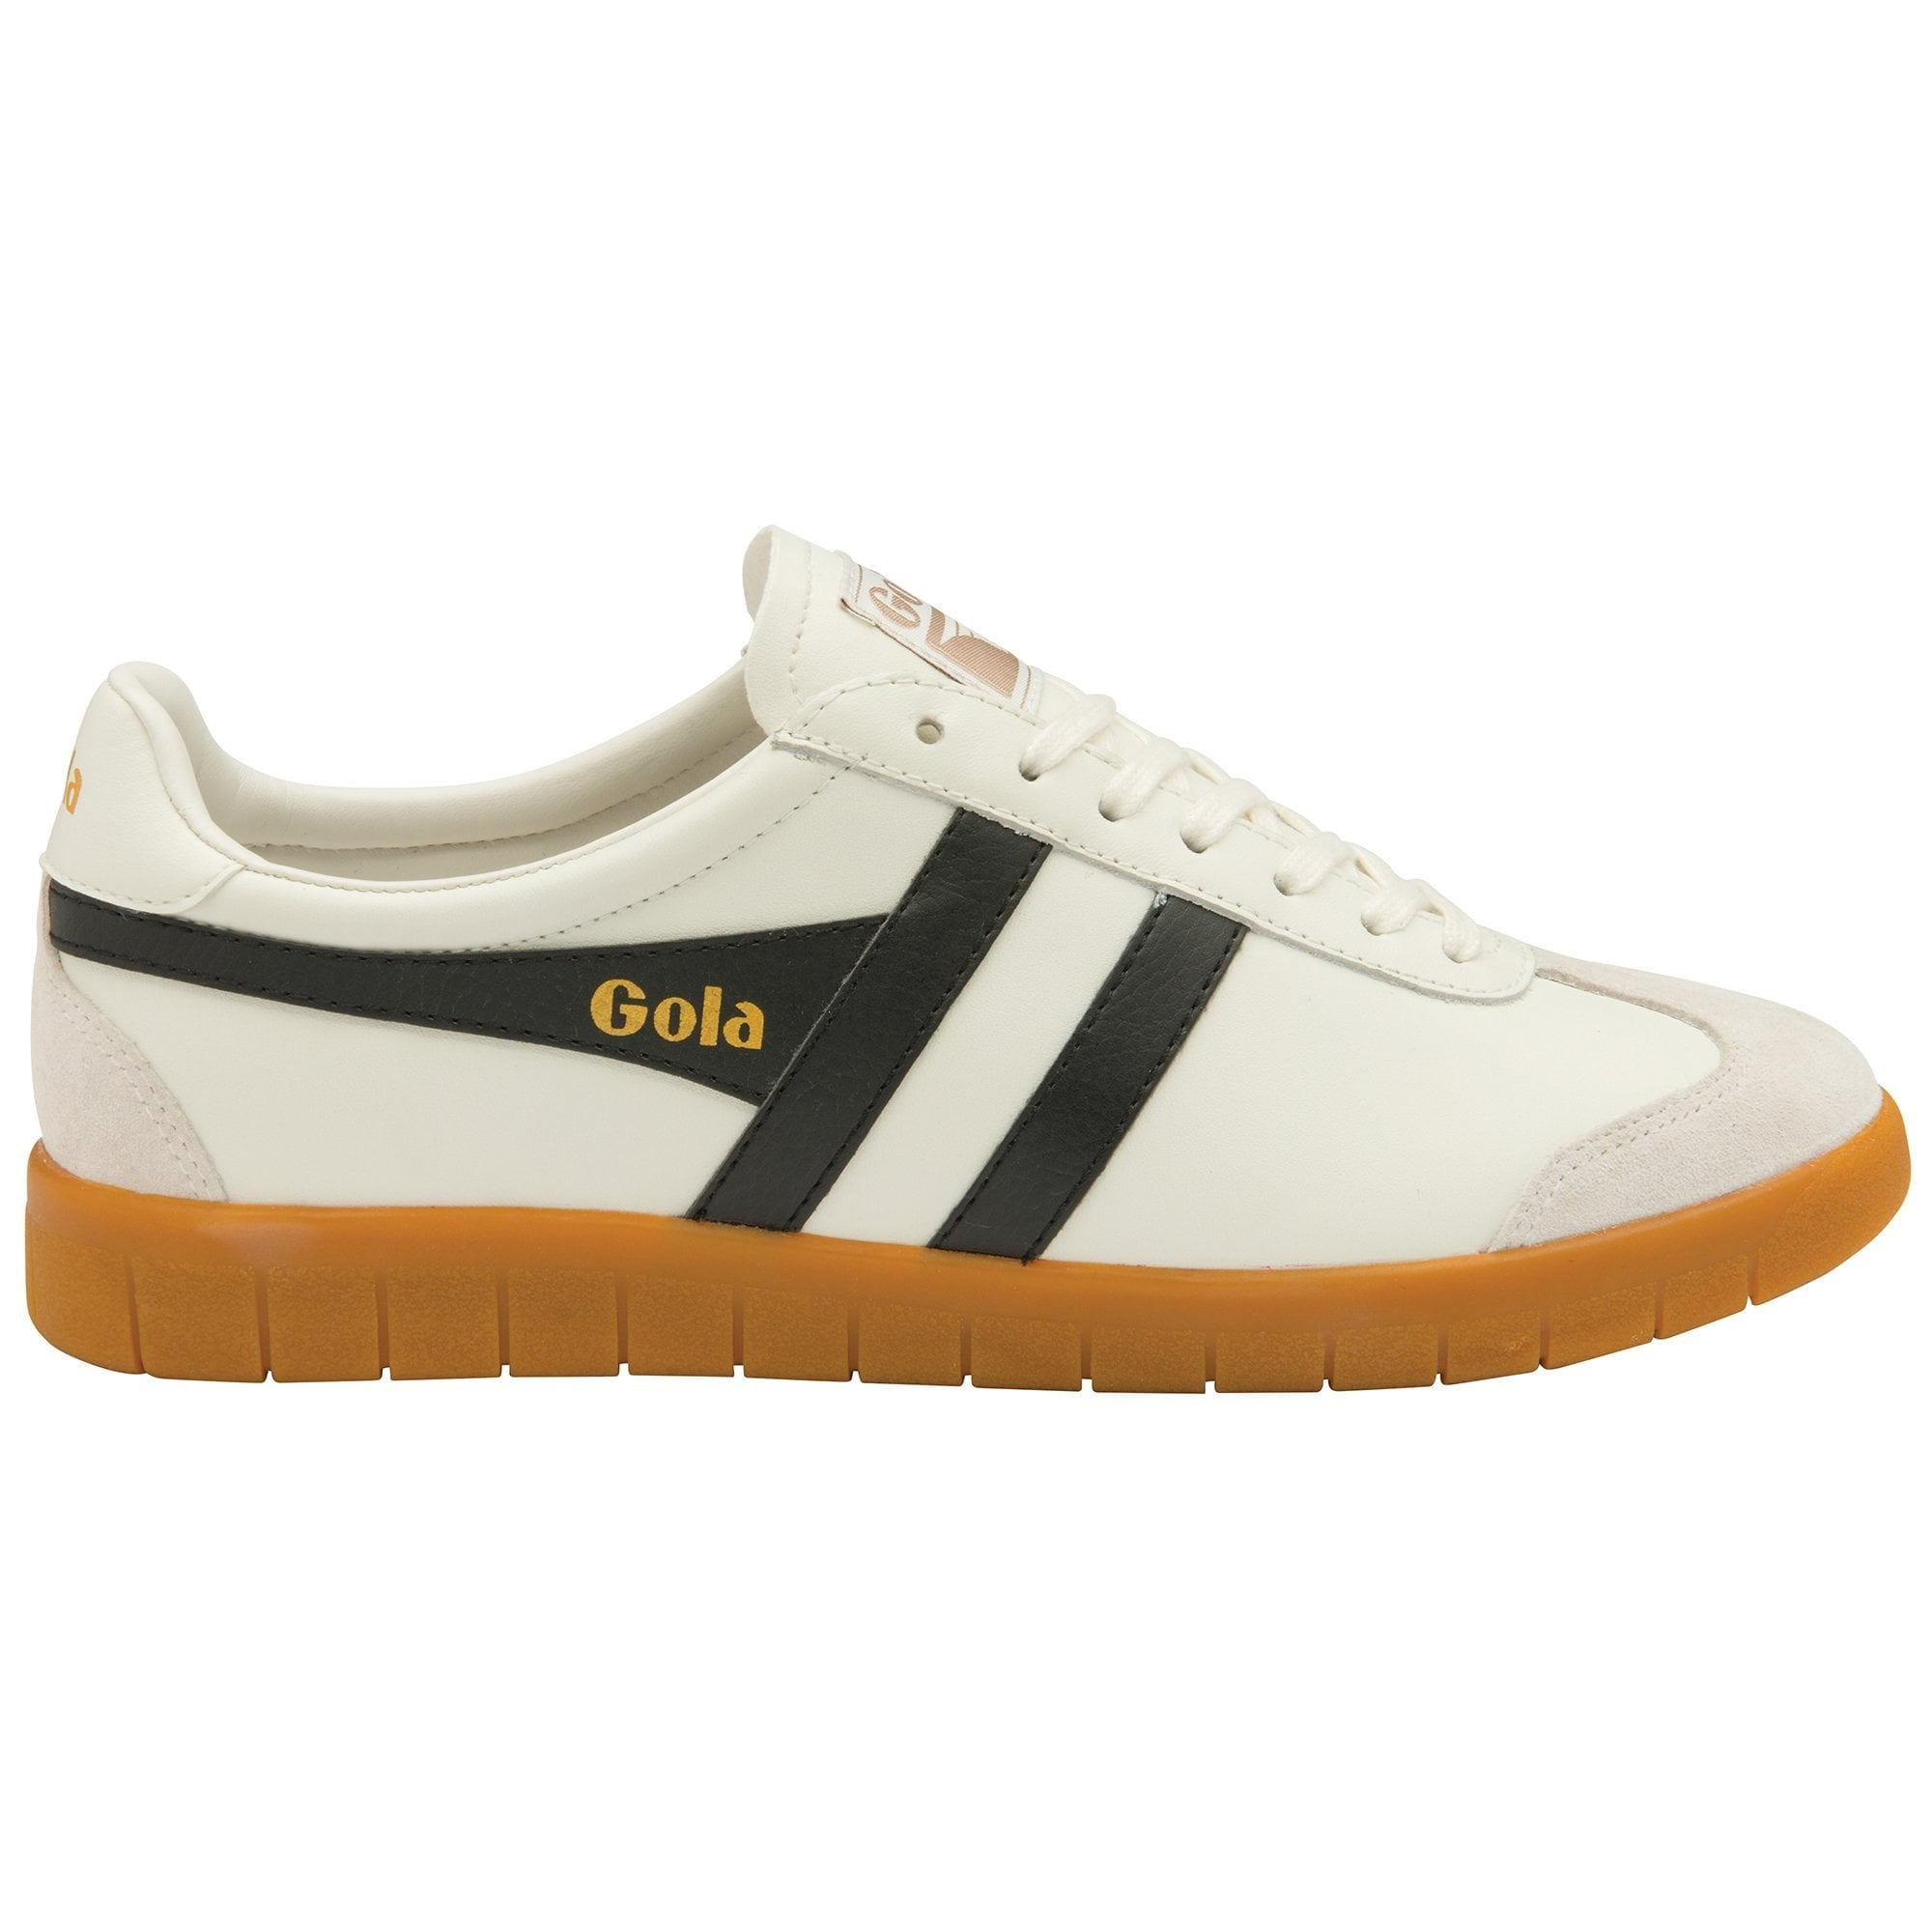 Gola Mens Hurricane Leather sneakers